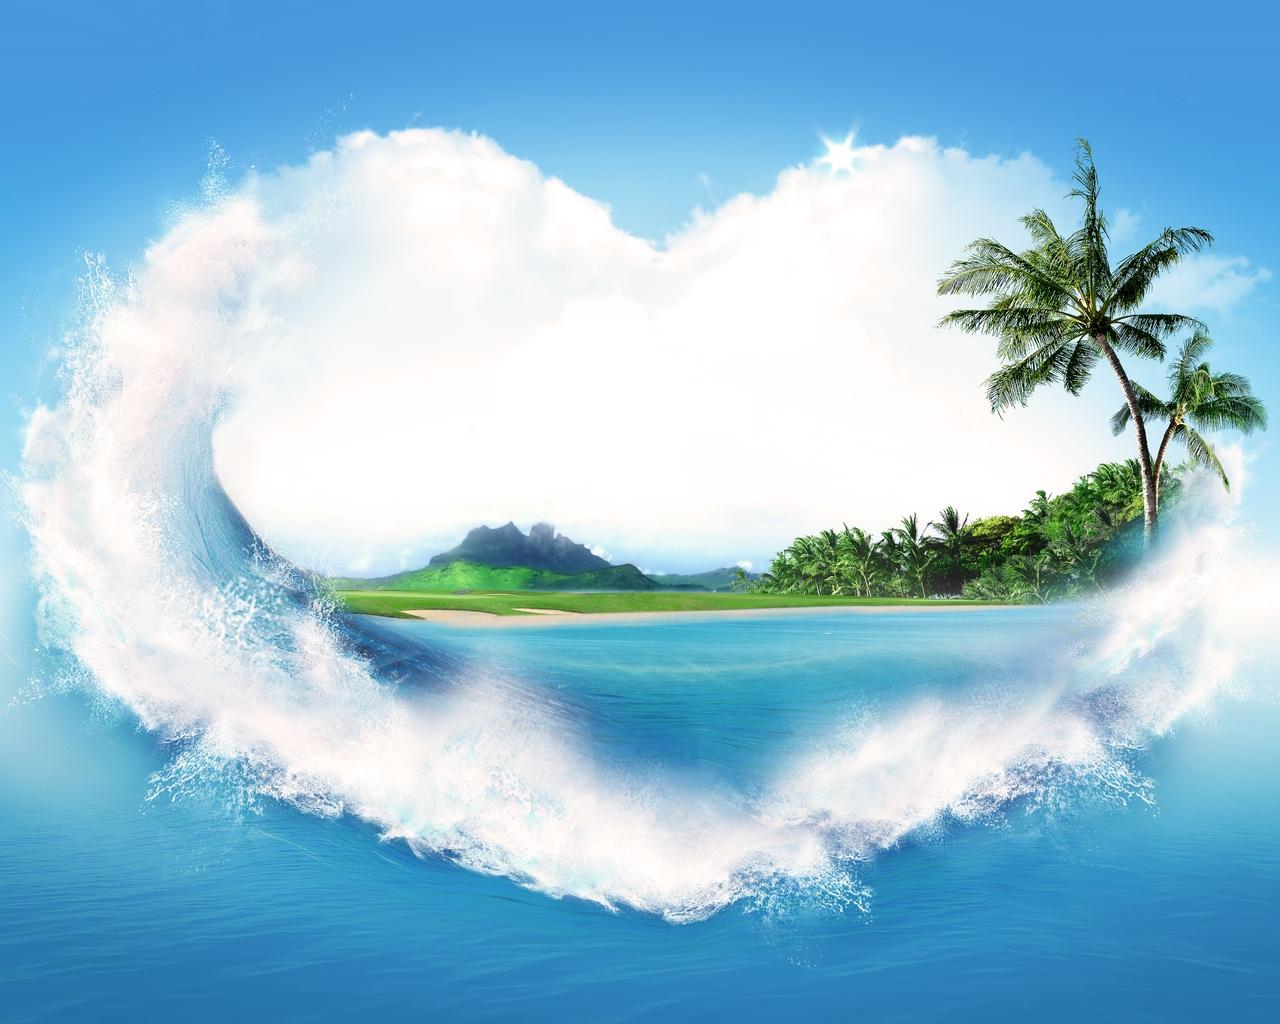 Best HD Love Romance and Heart Wallpapers Design 100 Best Design 1280x1024